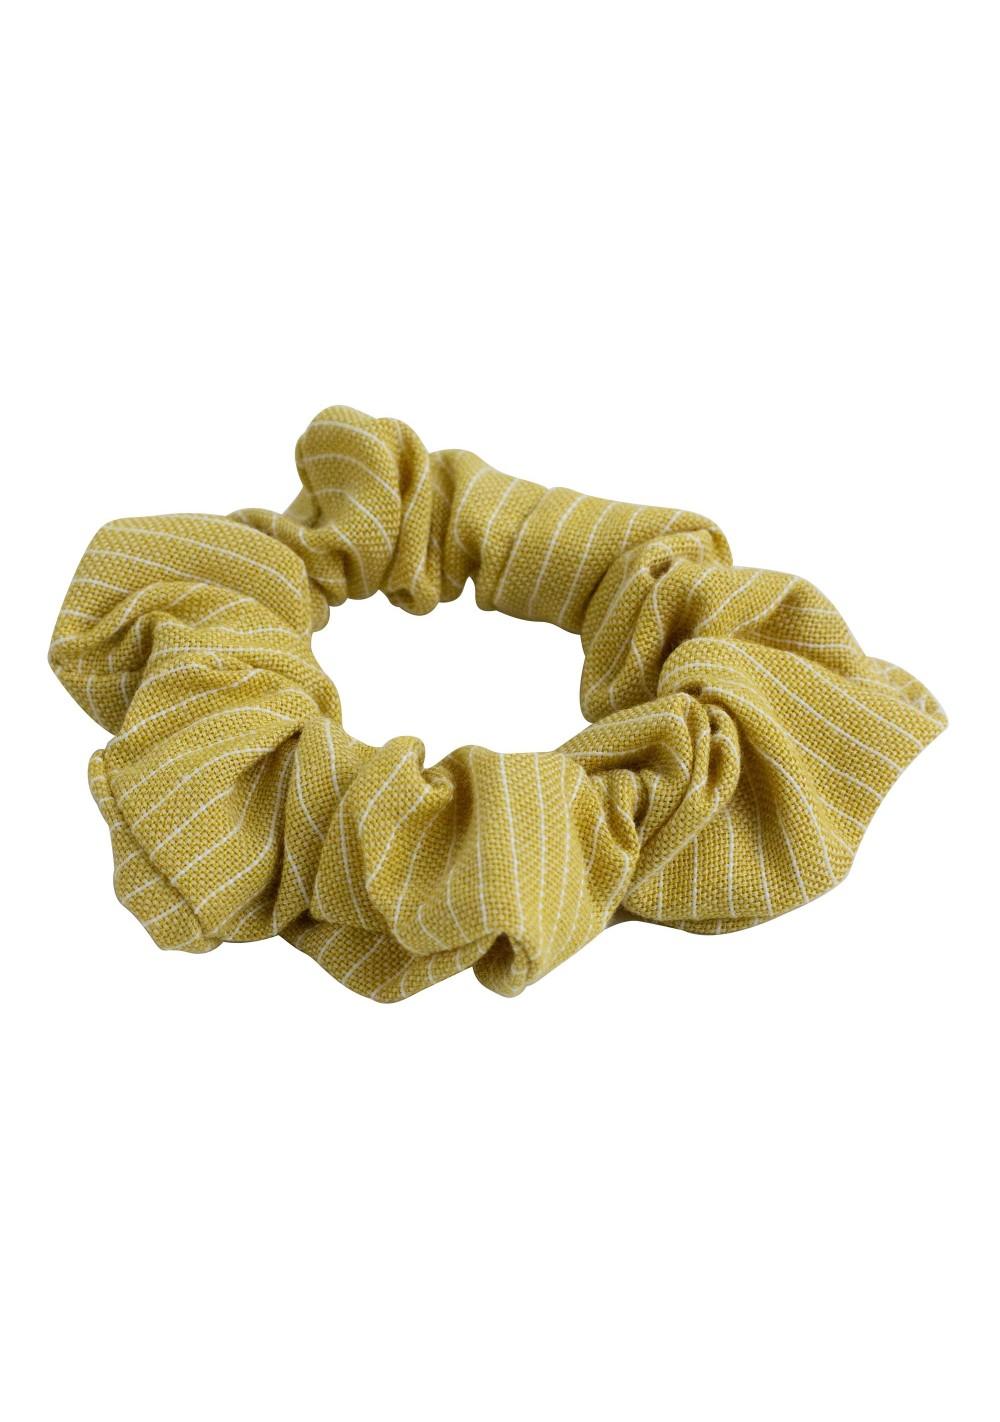 Ochre Gold scrunchie